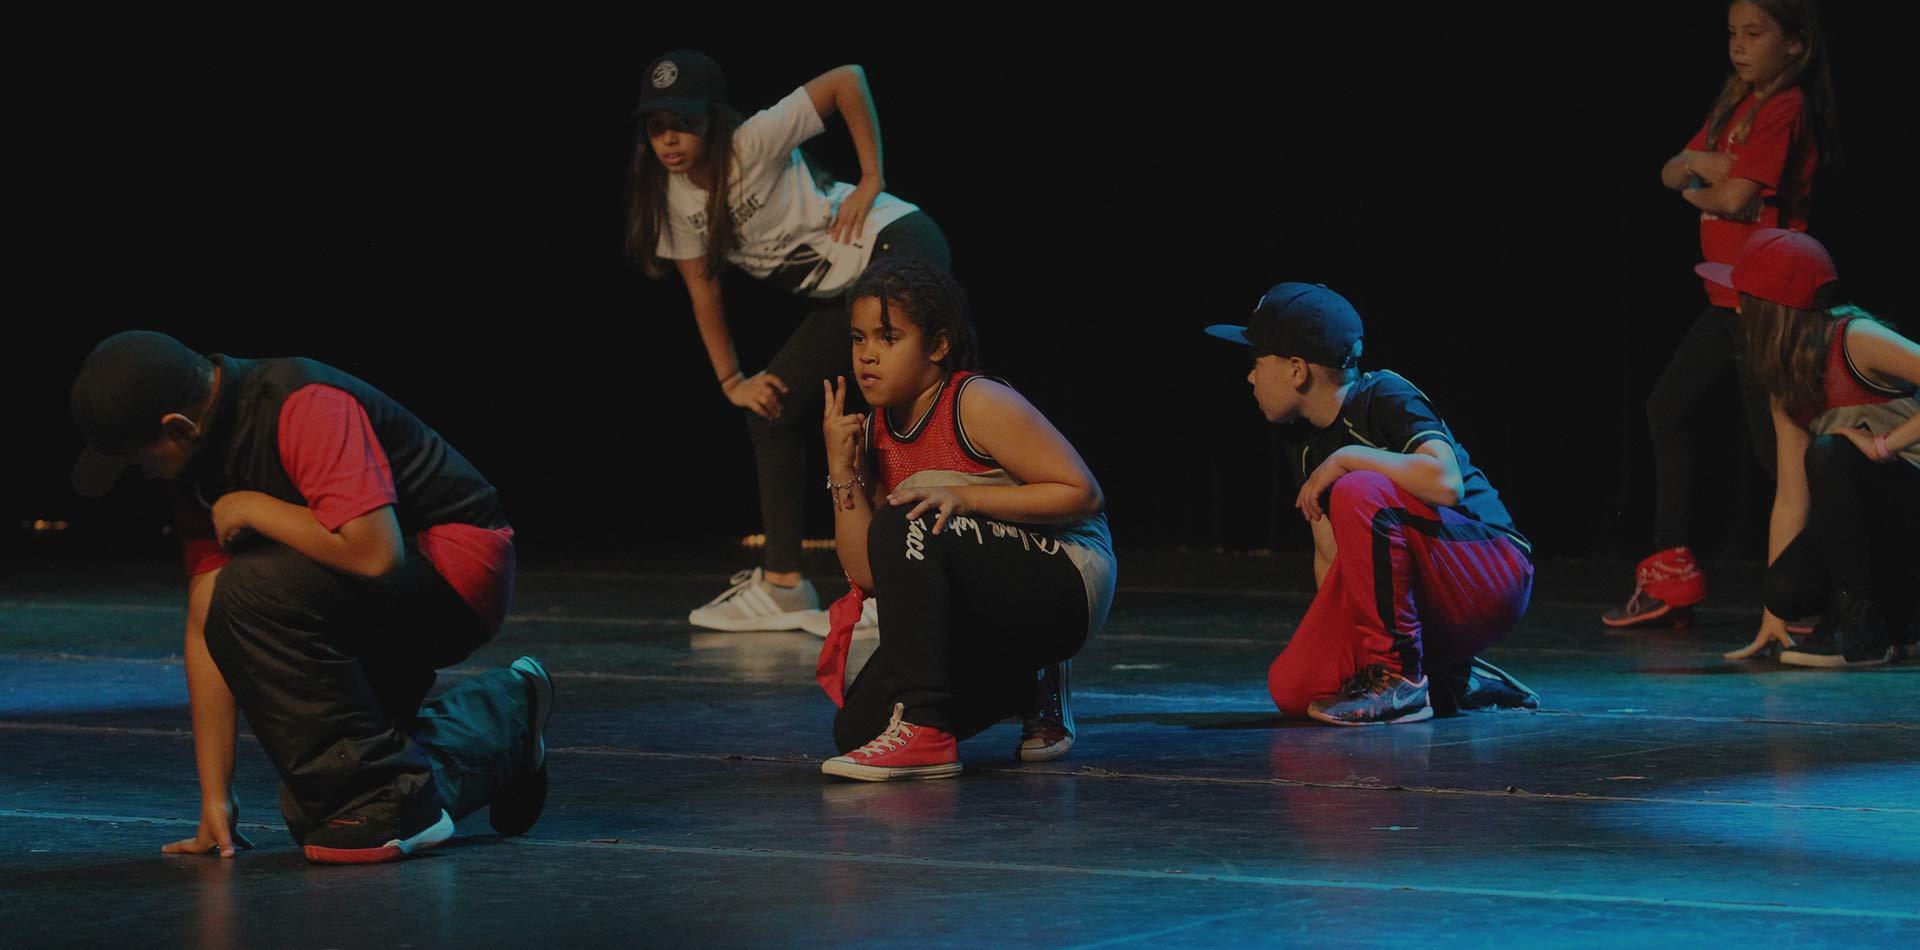 Joy_of_Dance_youth_private-lesson_banner-bg | Joy of Dance